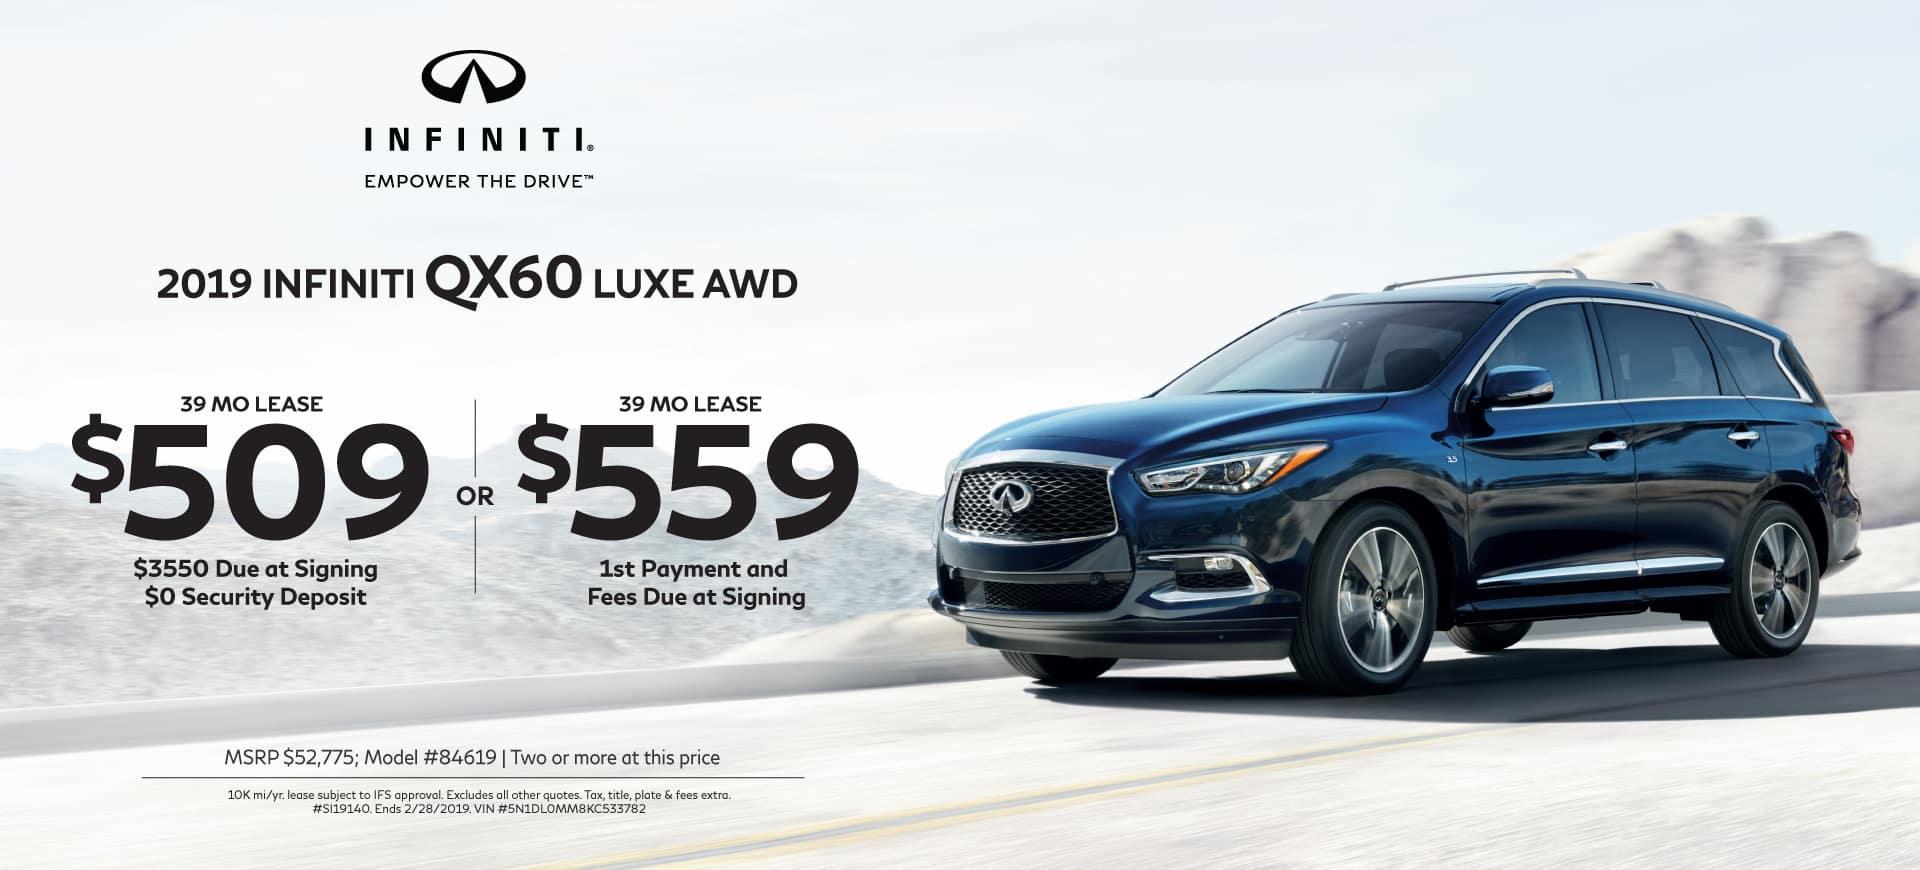 2019 INFINITI Specials QX60 AWD LUXE